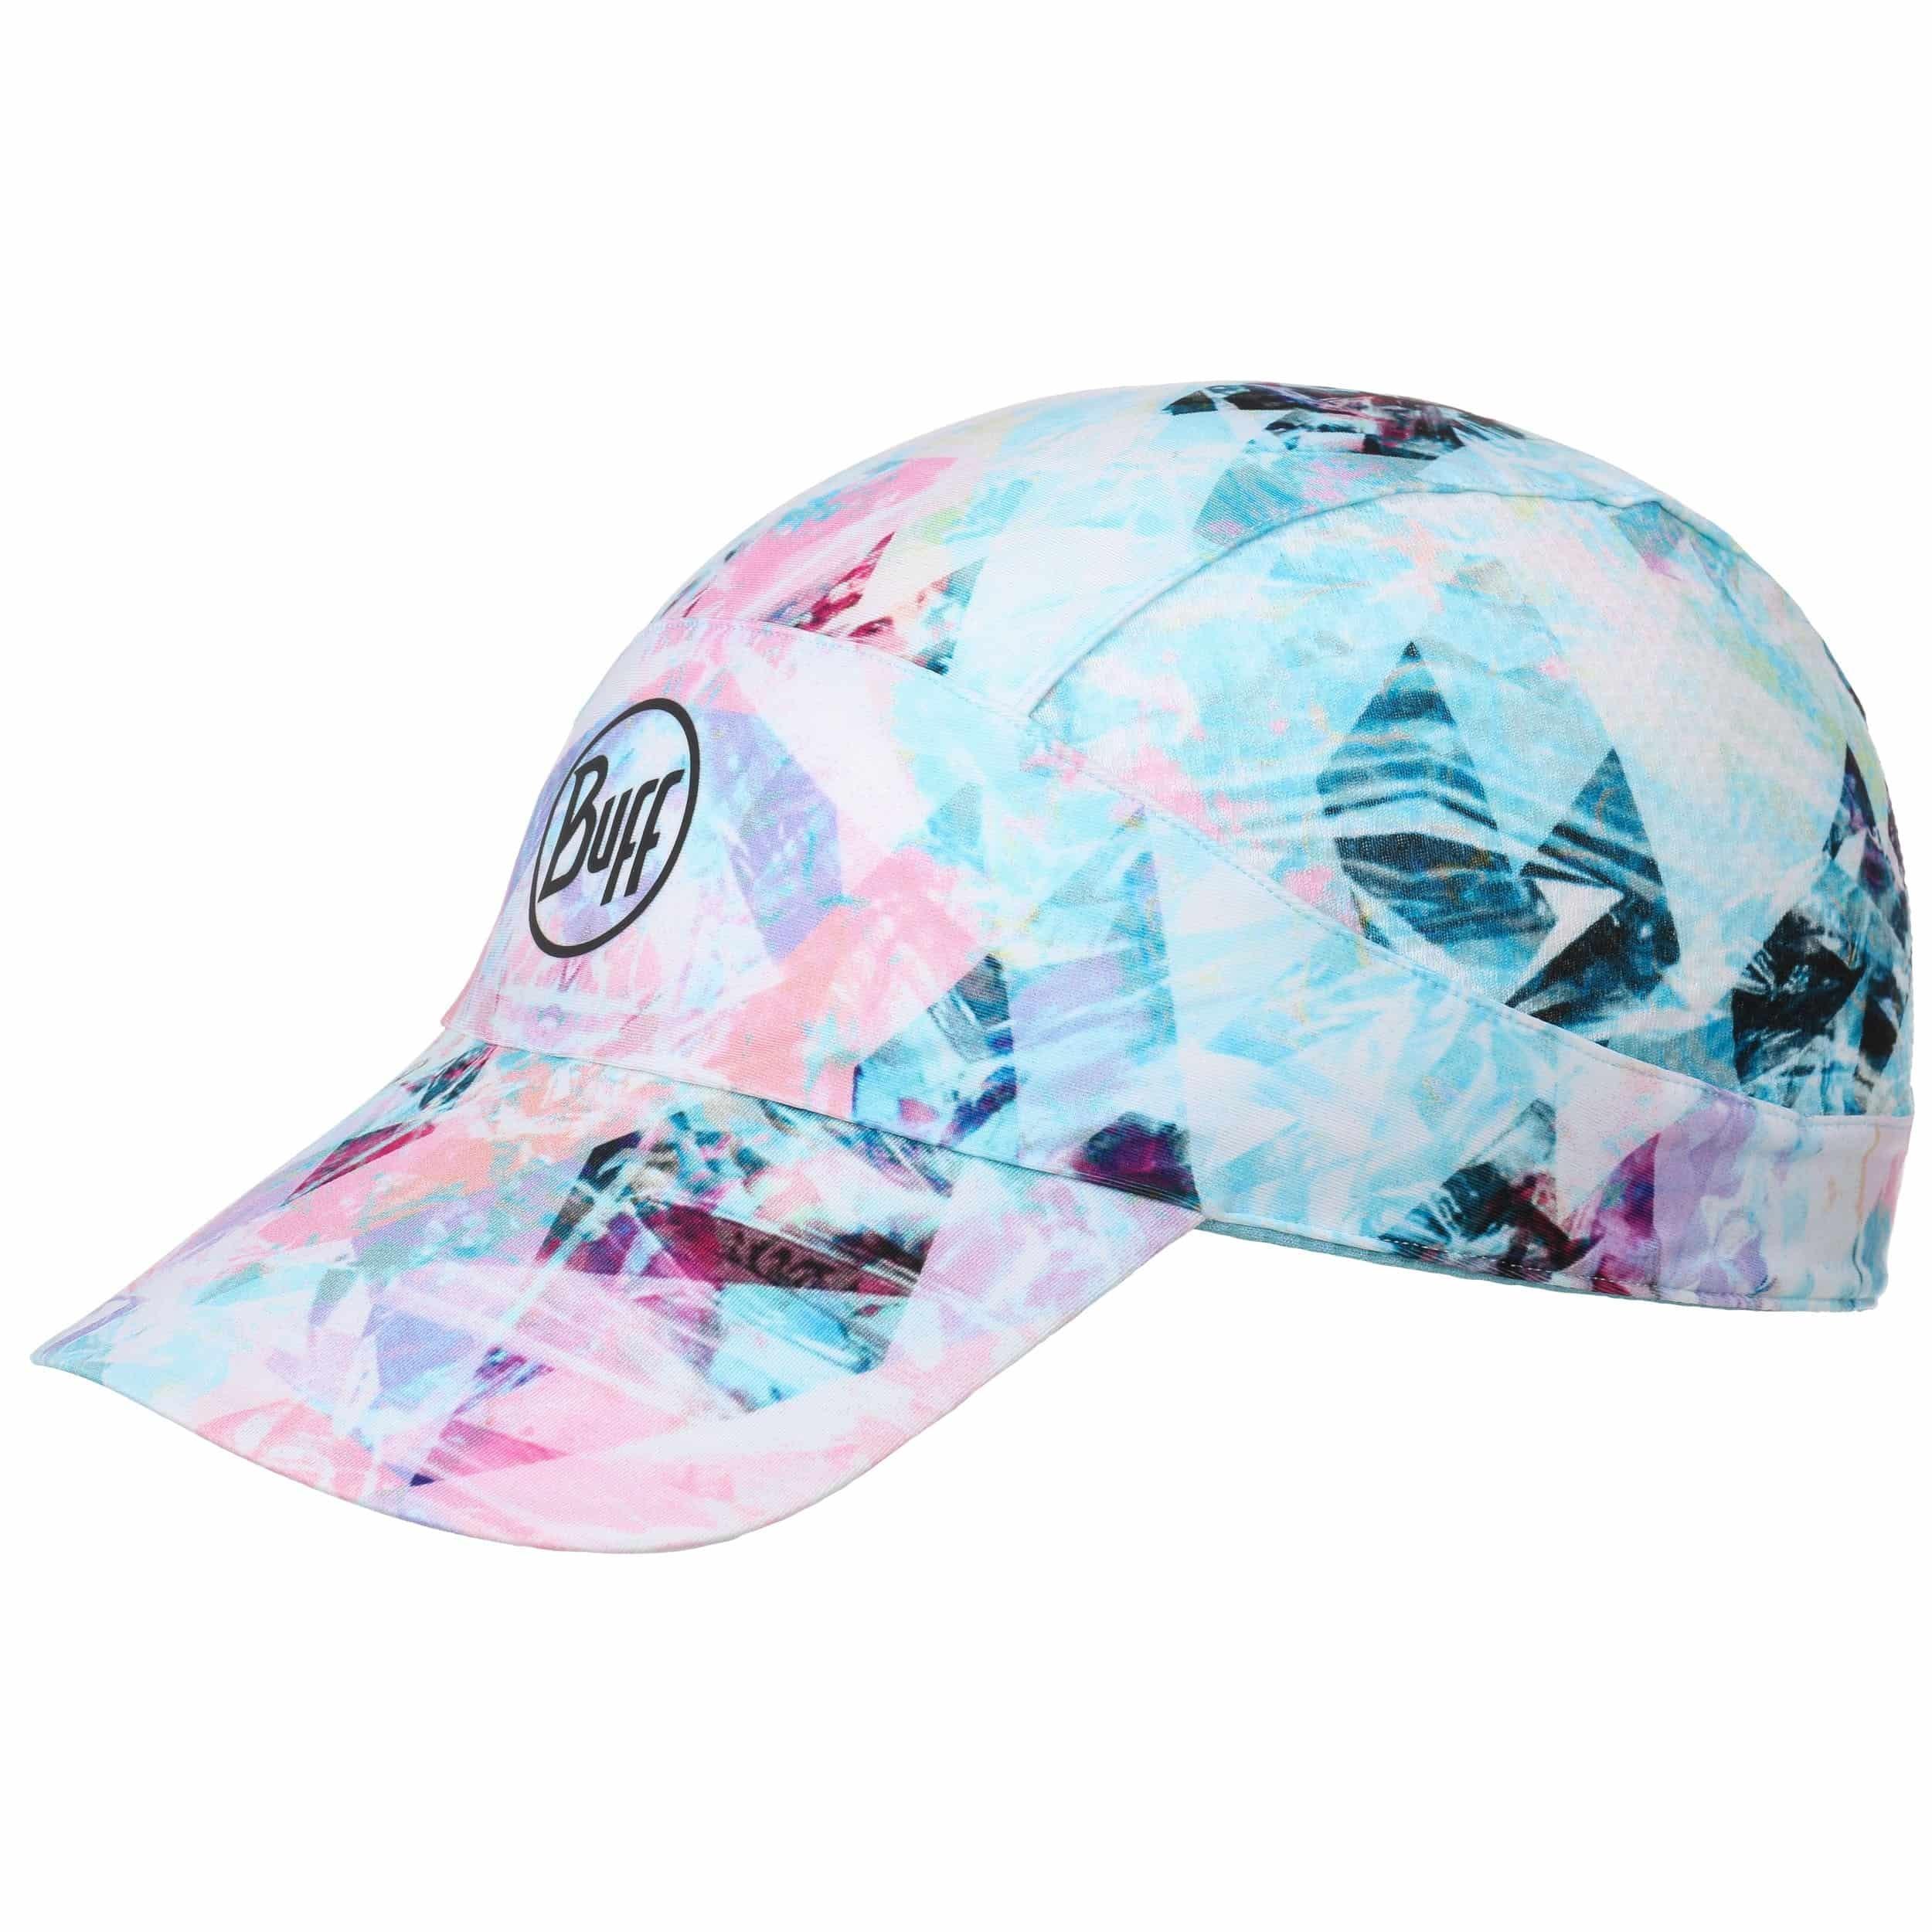 Buff R-Shining Pink Pro Run Cap Baseball Sports